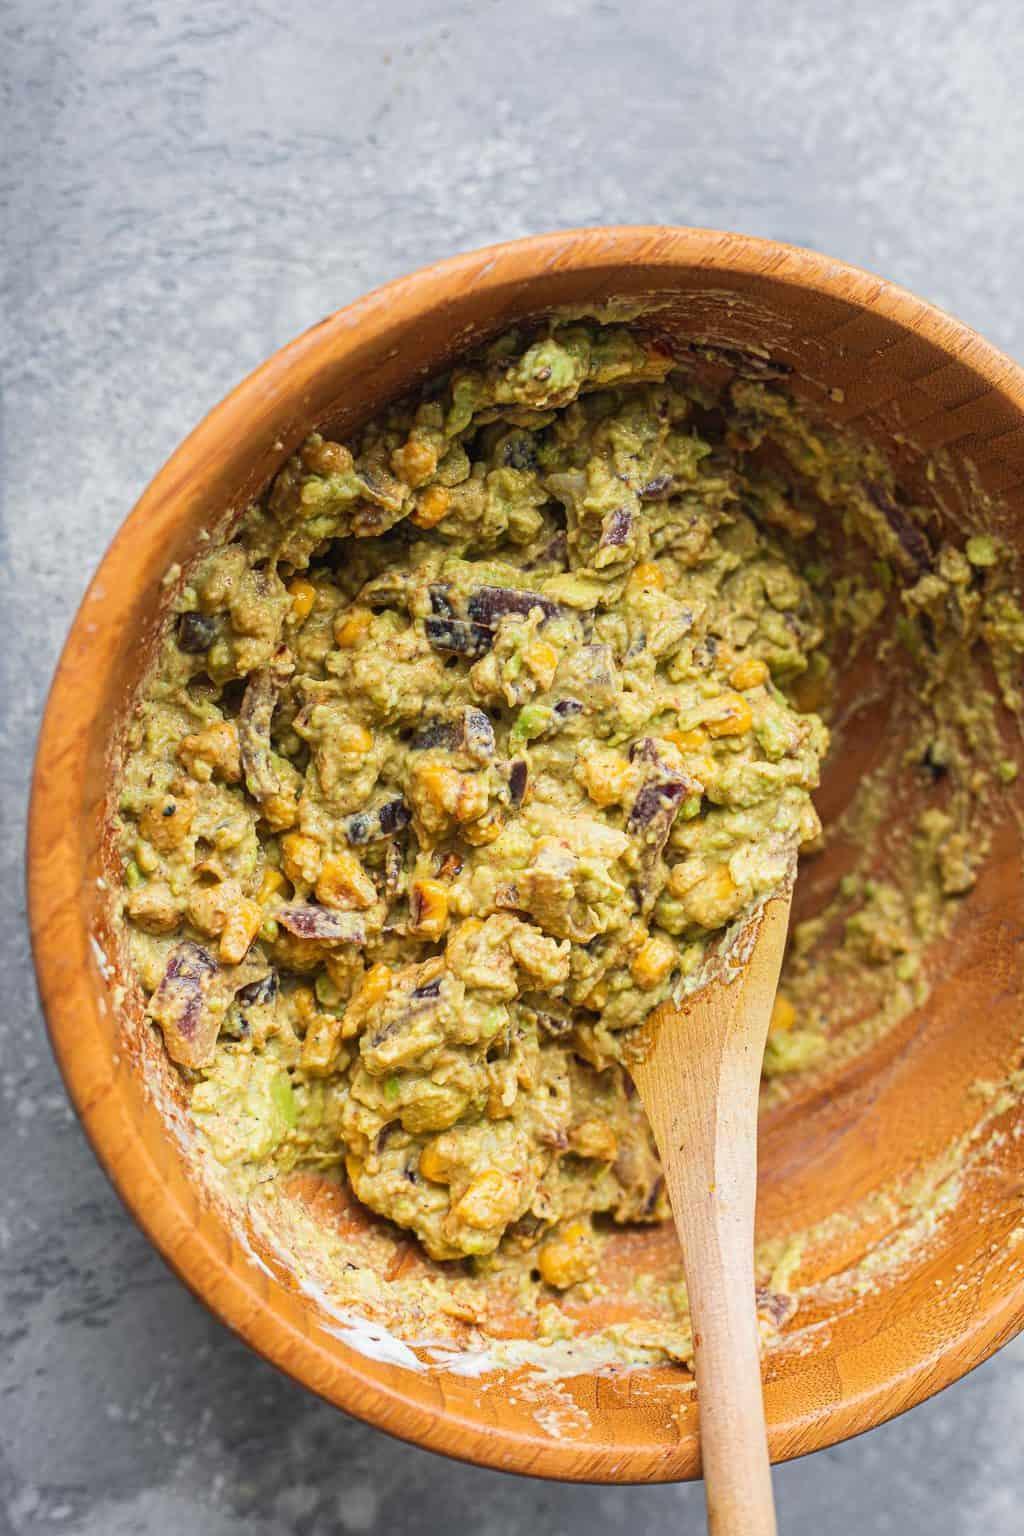 Guacamole in a mixing bowl